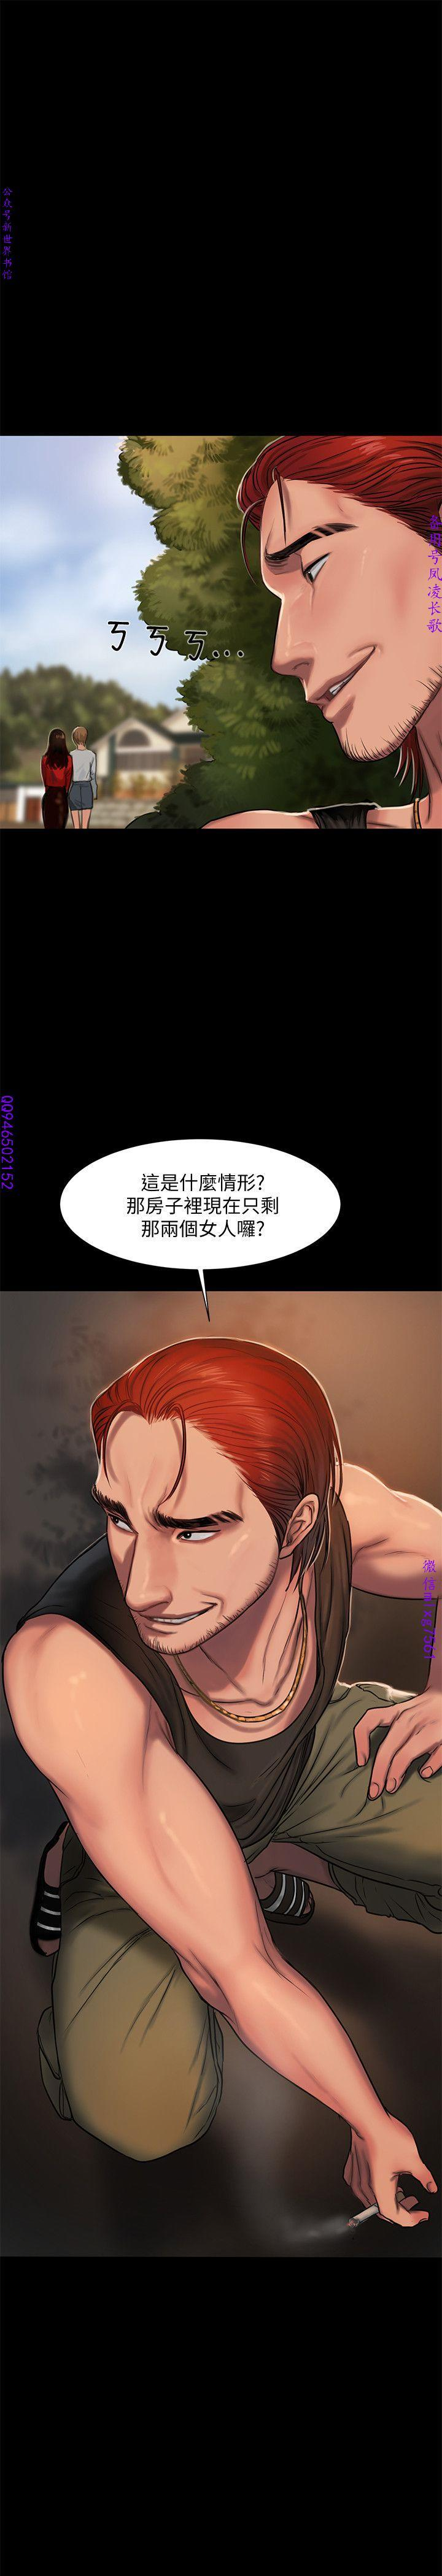 Run away 1-10【中文】 188